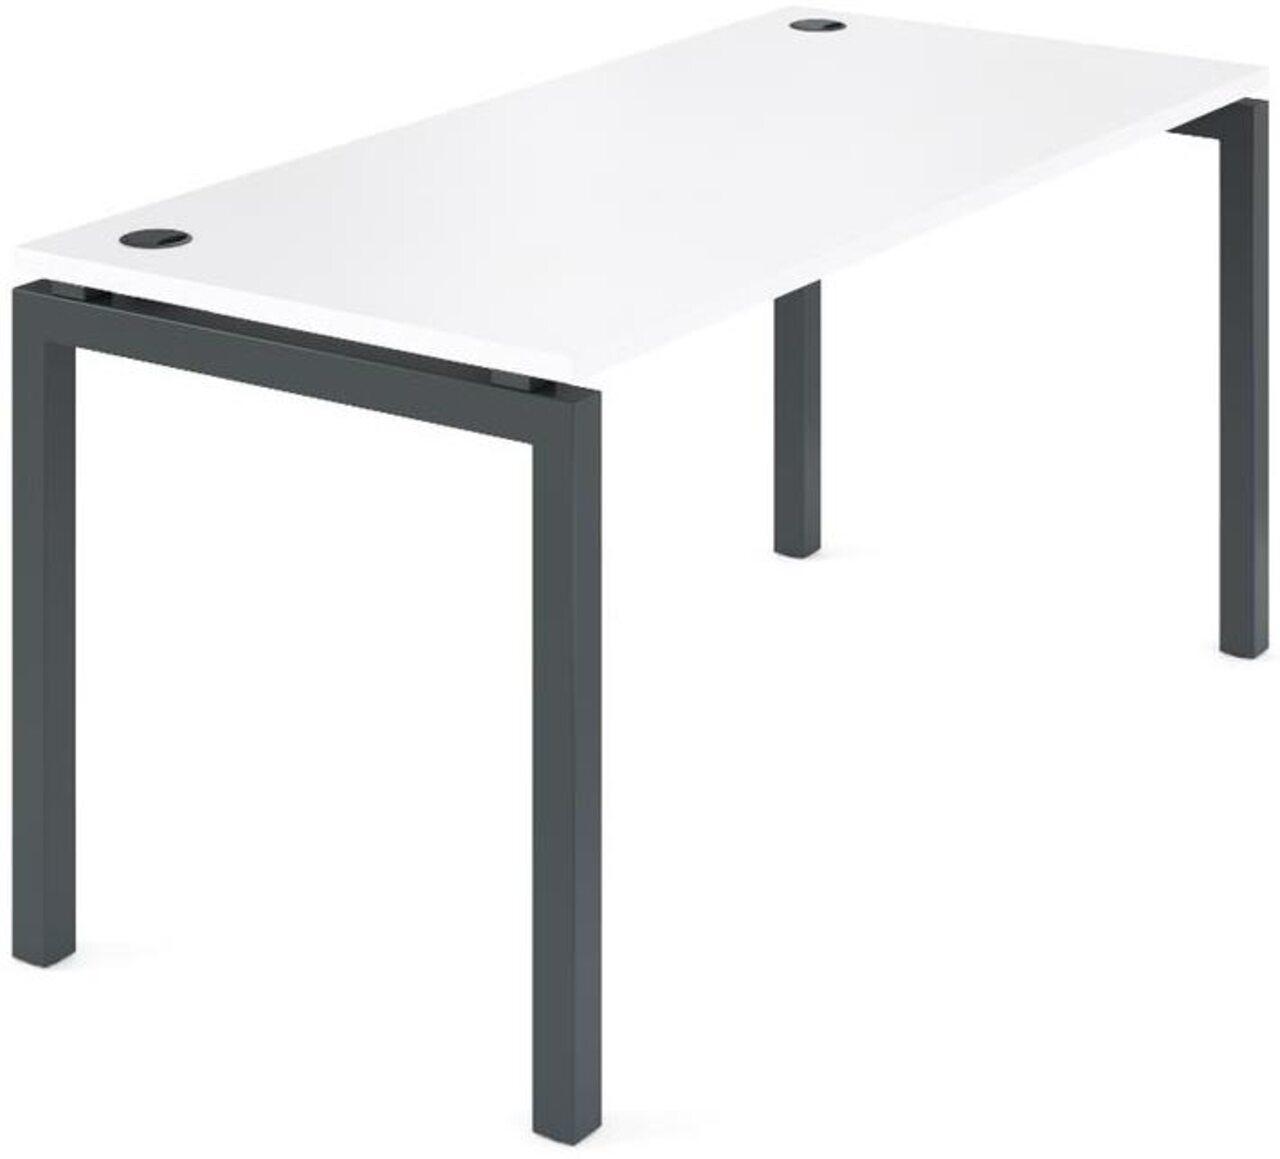 Стол на металлокаркасе  Арго 160x73x76 - фото 5